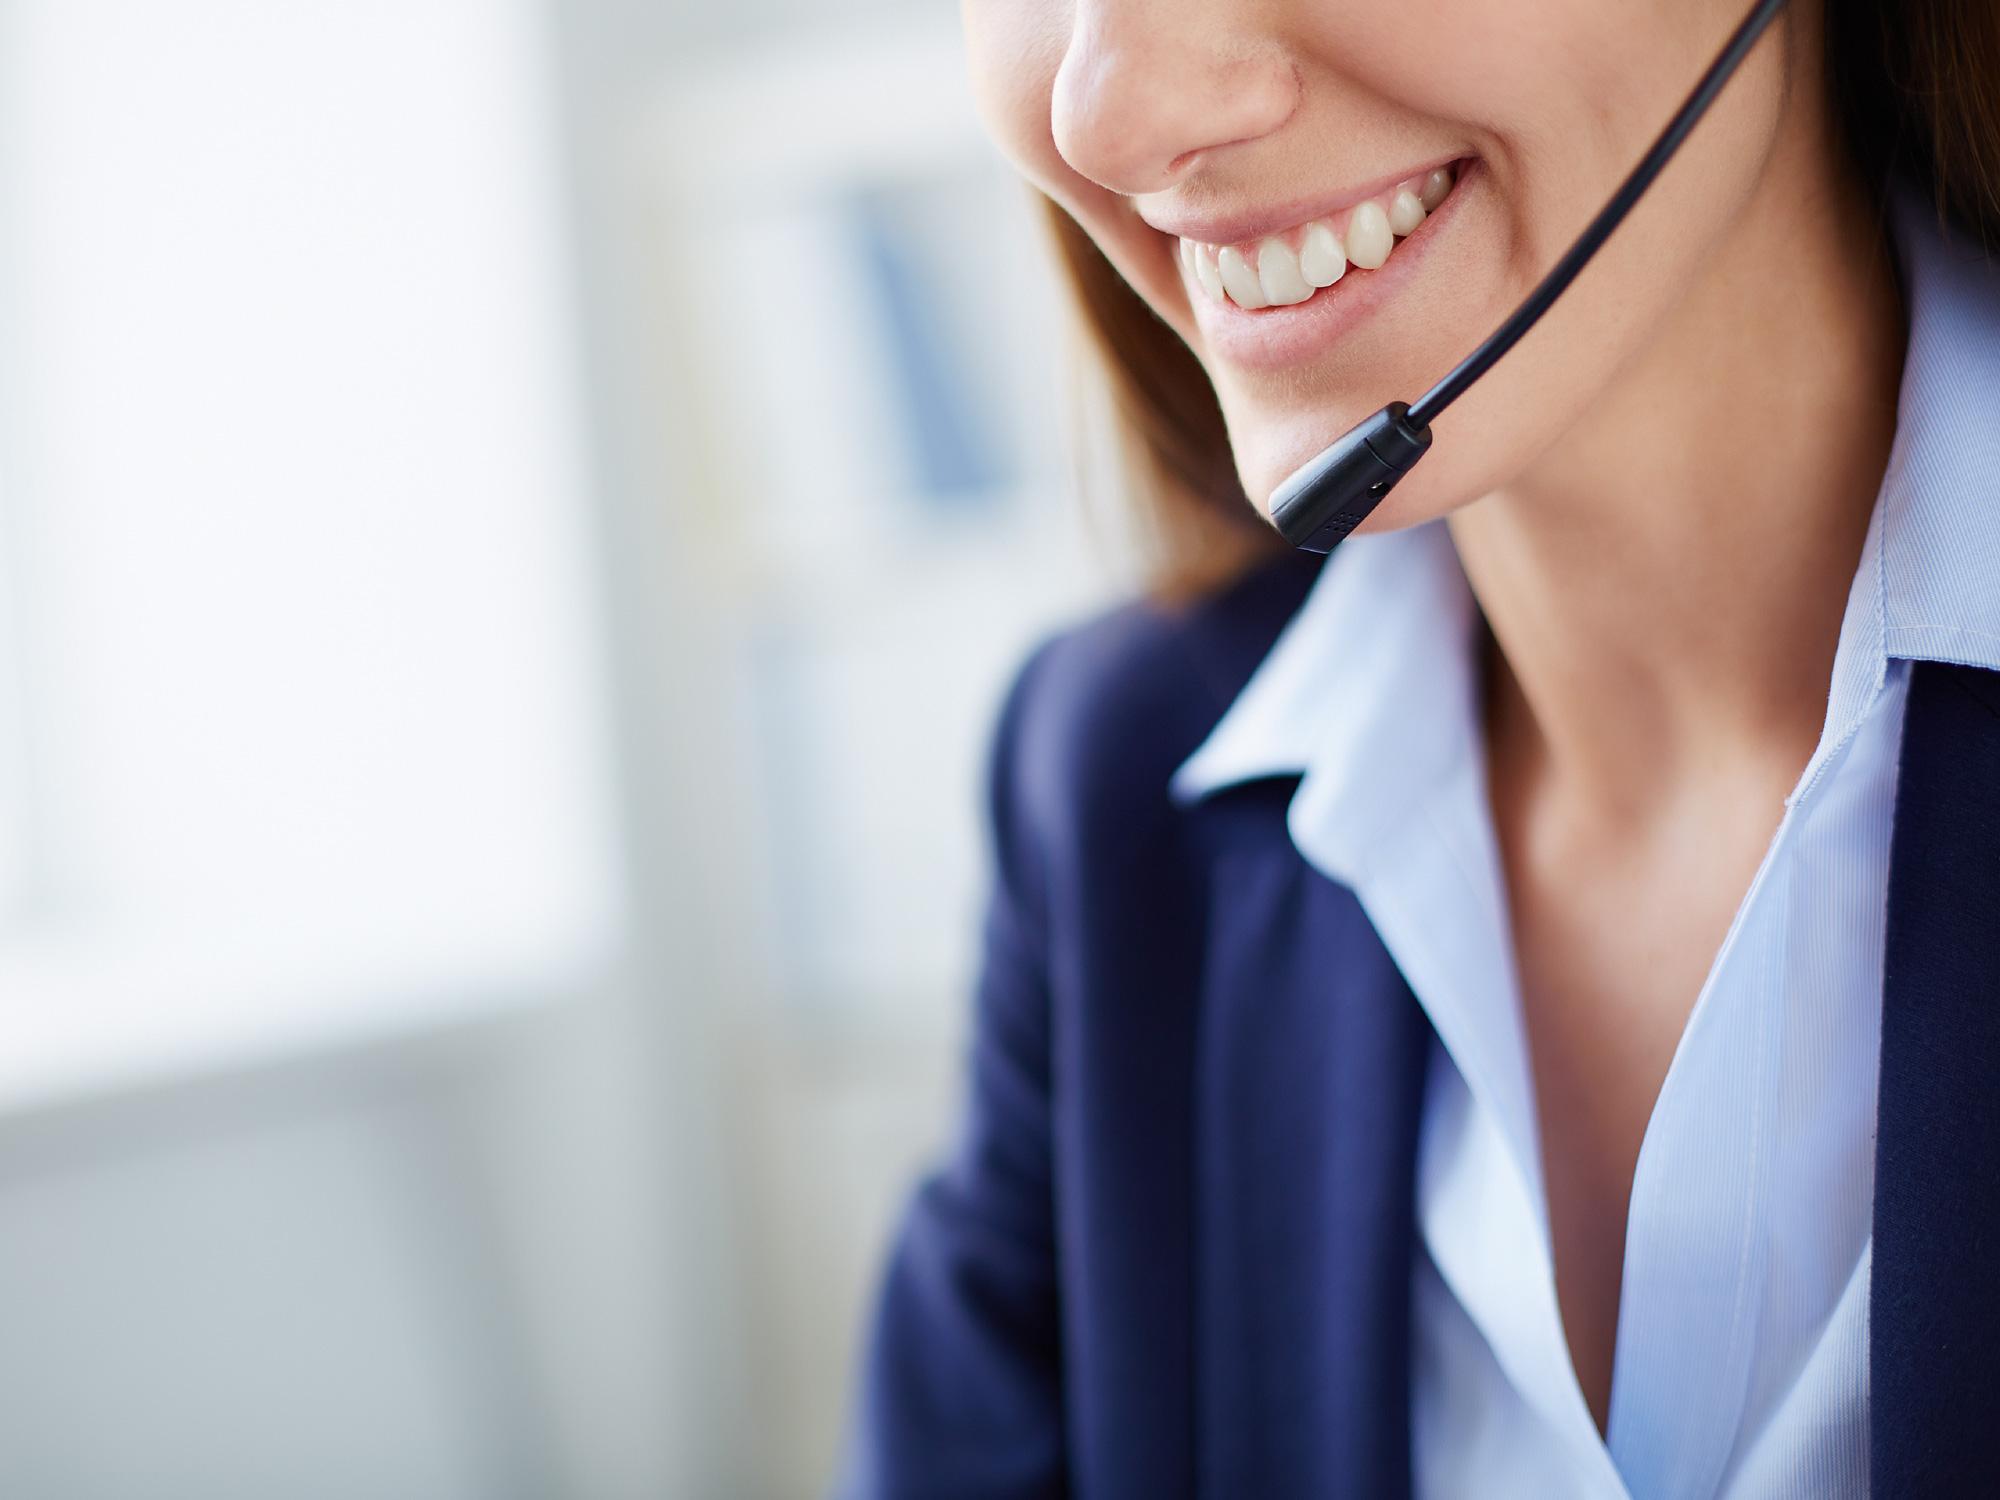 mhp-blog-claves-de-la-comunicacion-telefonica